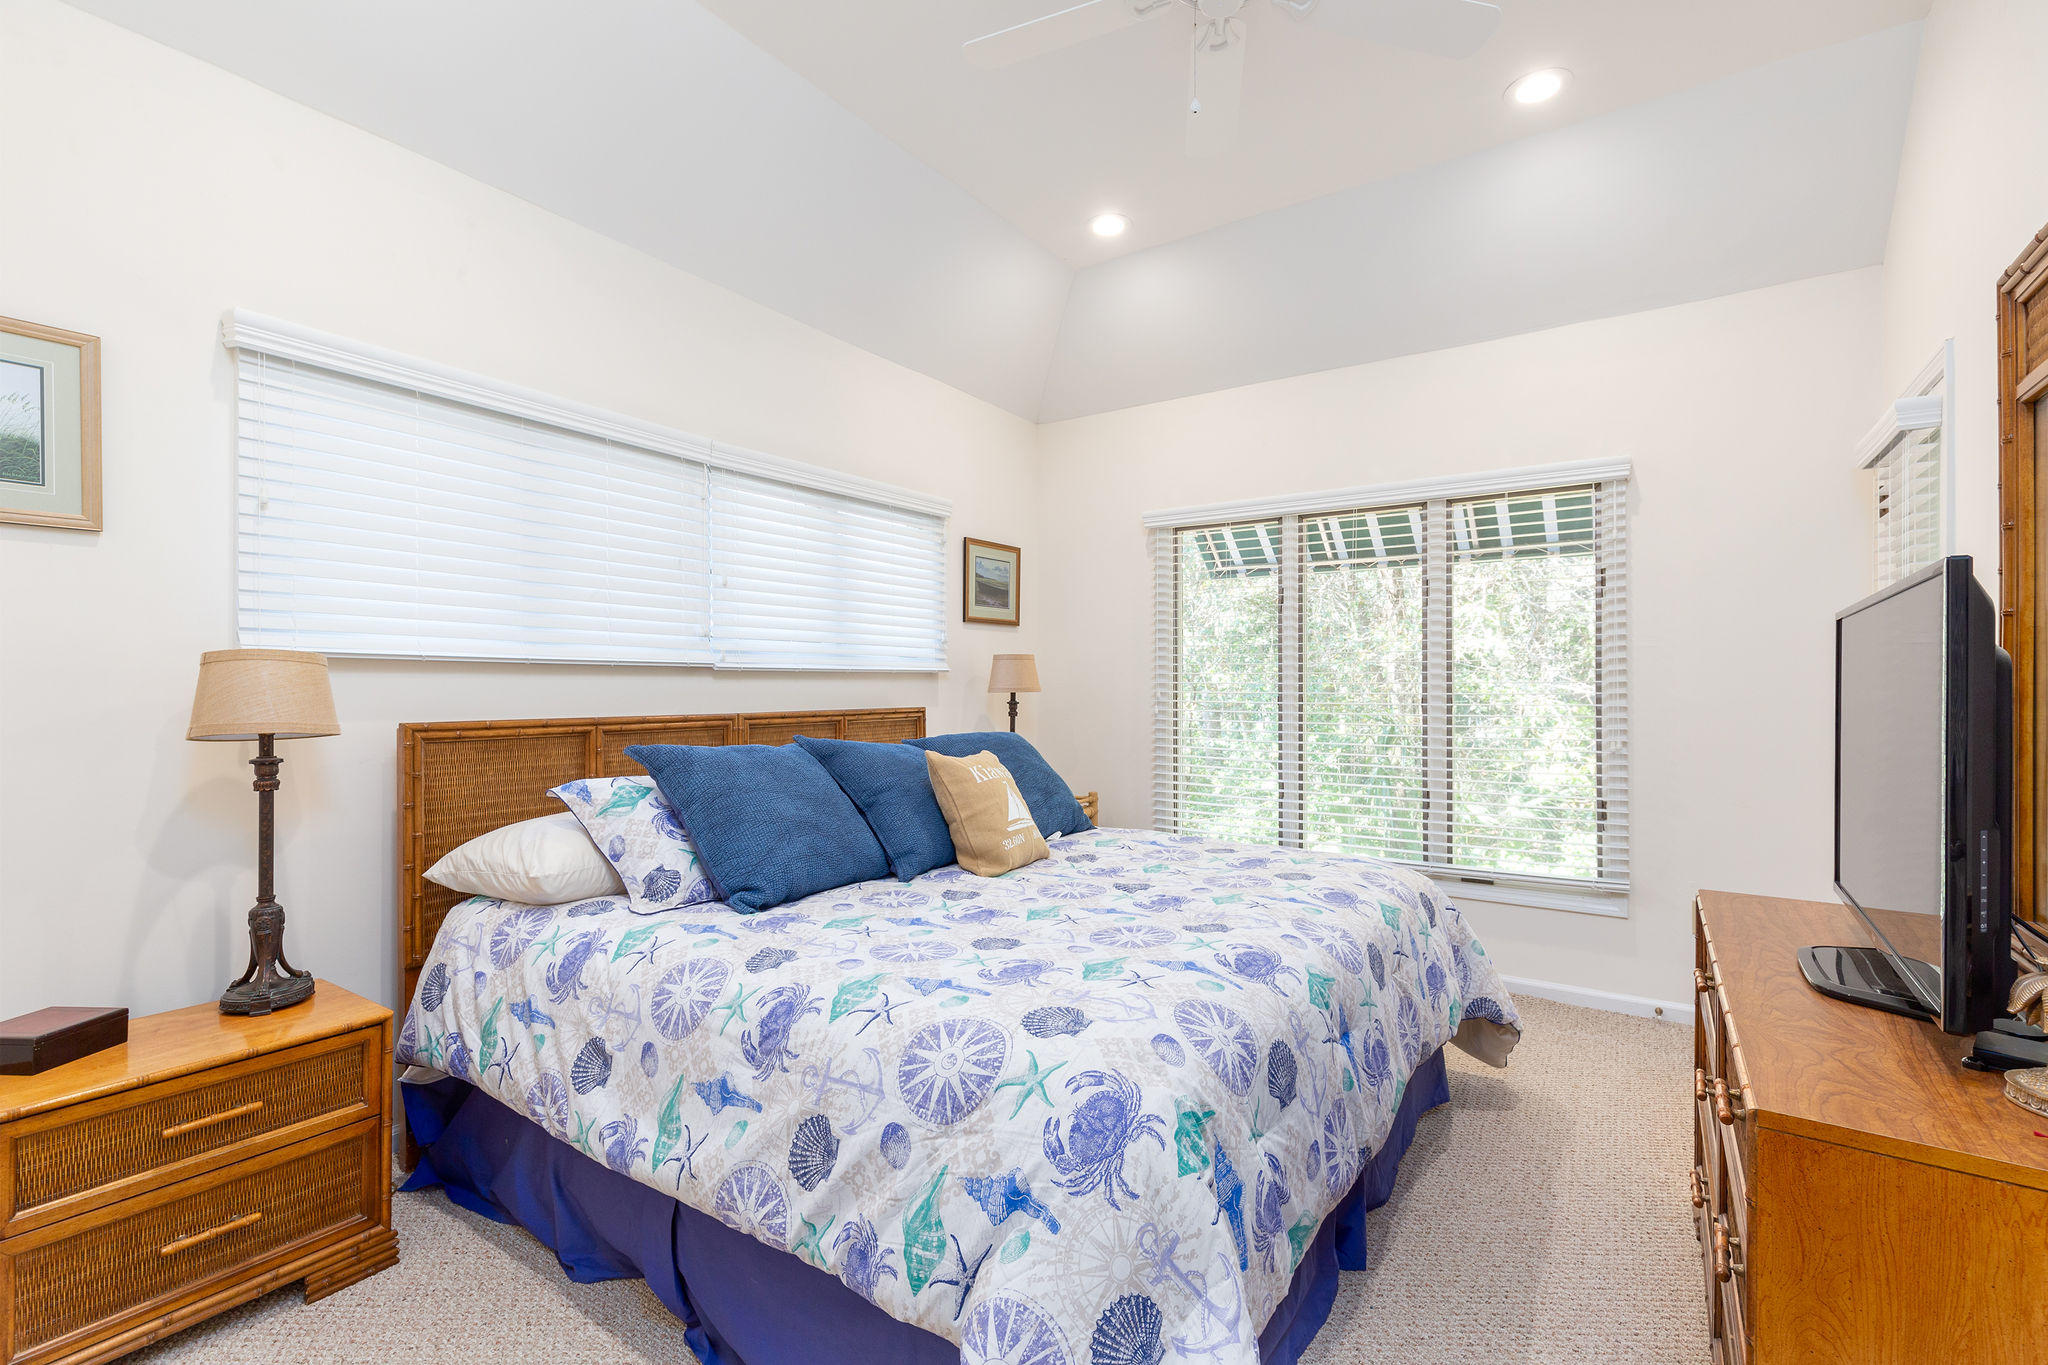 Kiawah Island Homes For Sale - 4767 Tennis Club, Kiawah Island, SC - 2